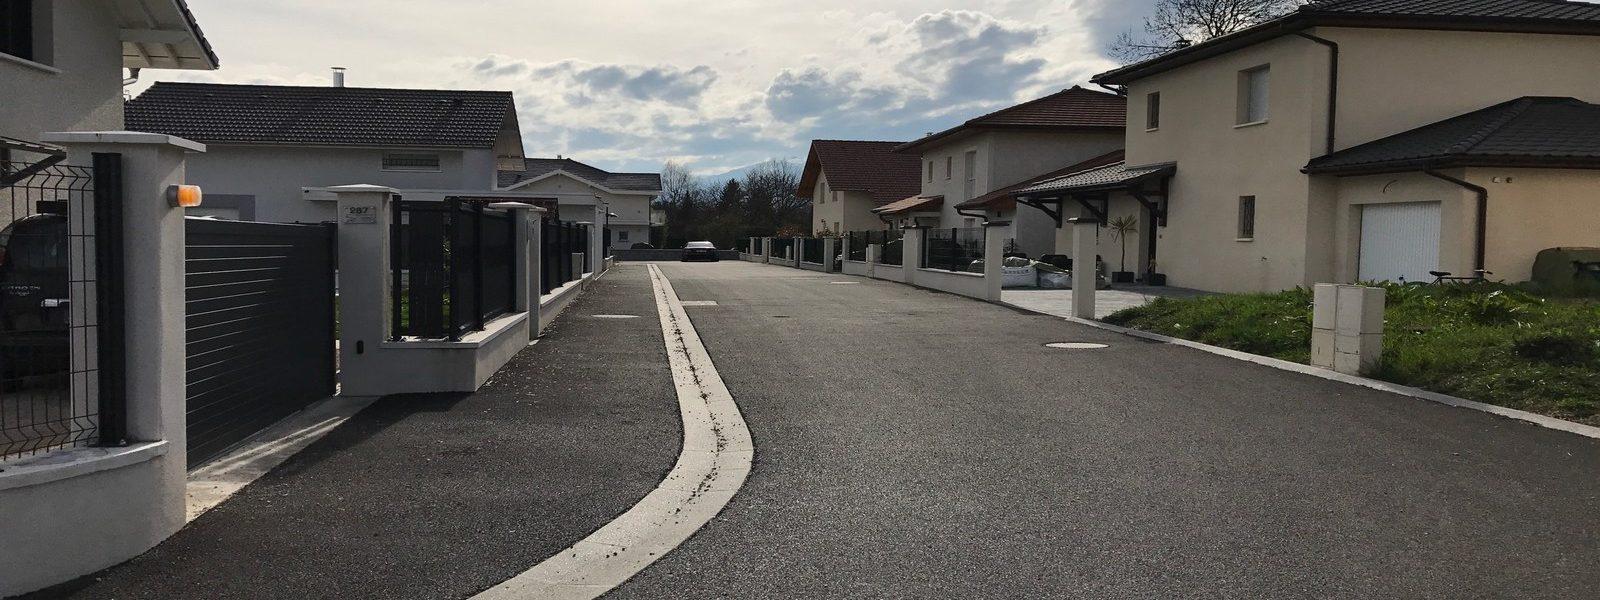 QUARTIER VARFEUILLE - Visuel 2 - Impact immobilier 01